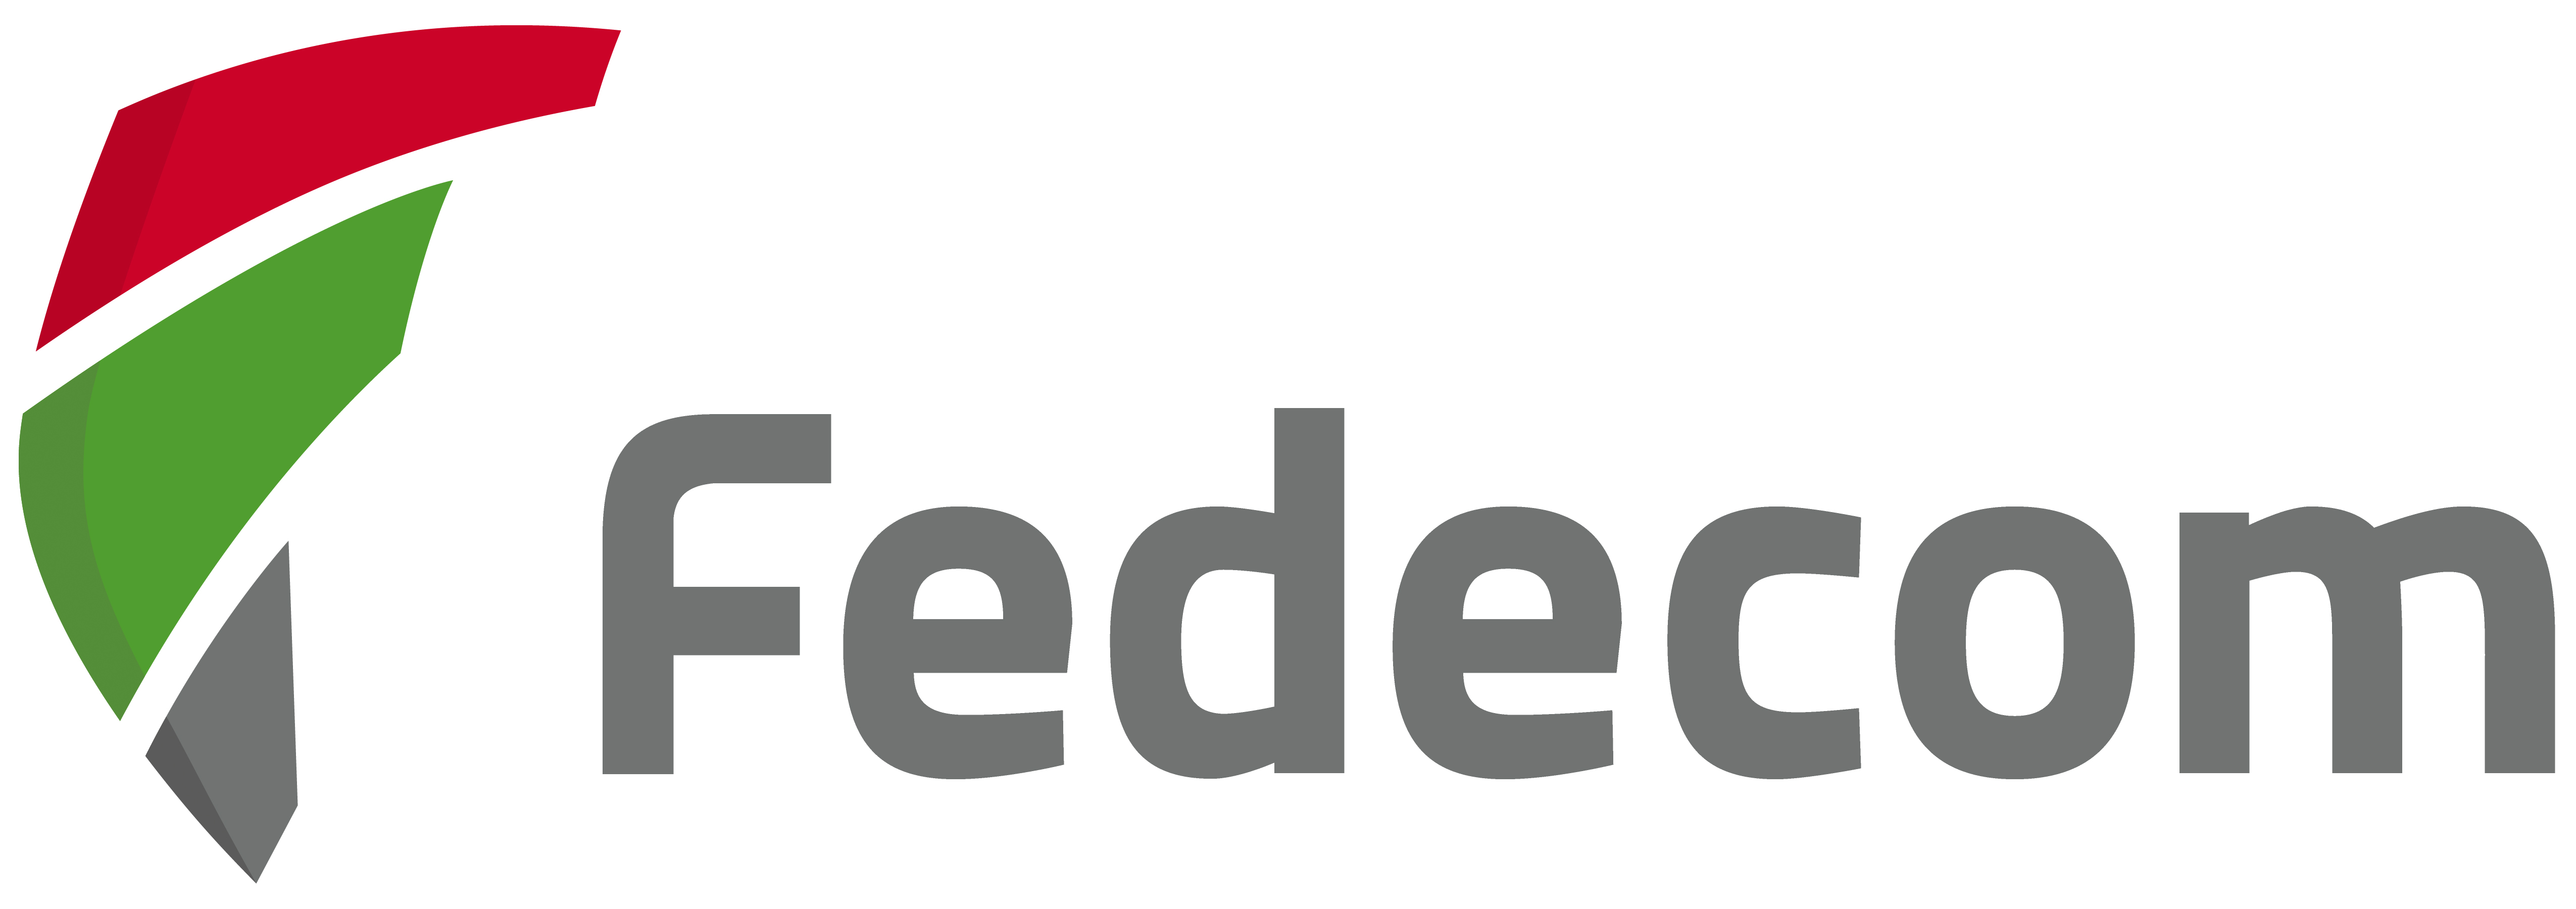 FEDECOM_CMYK